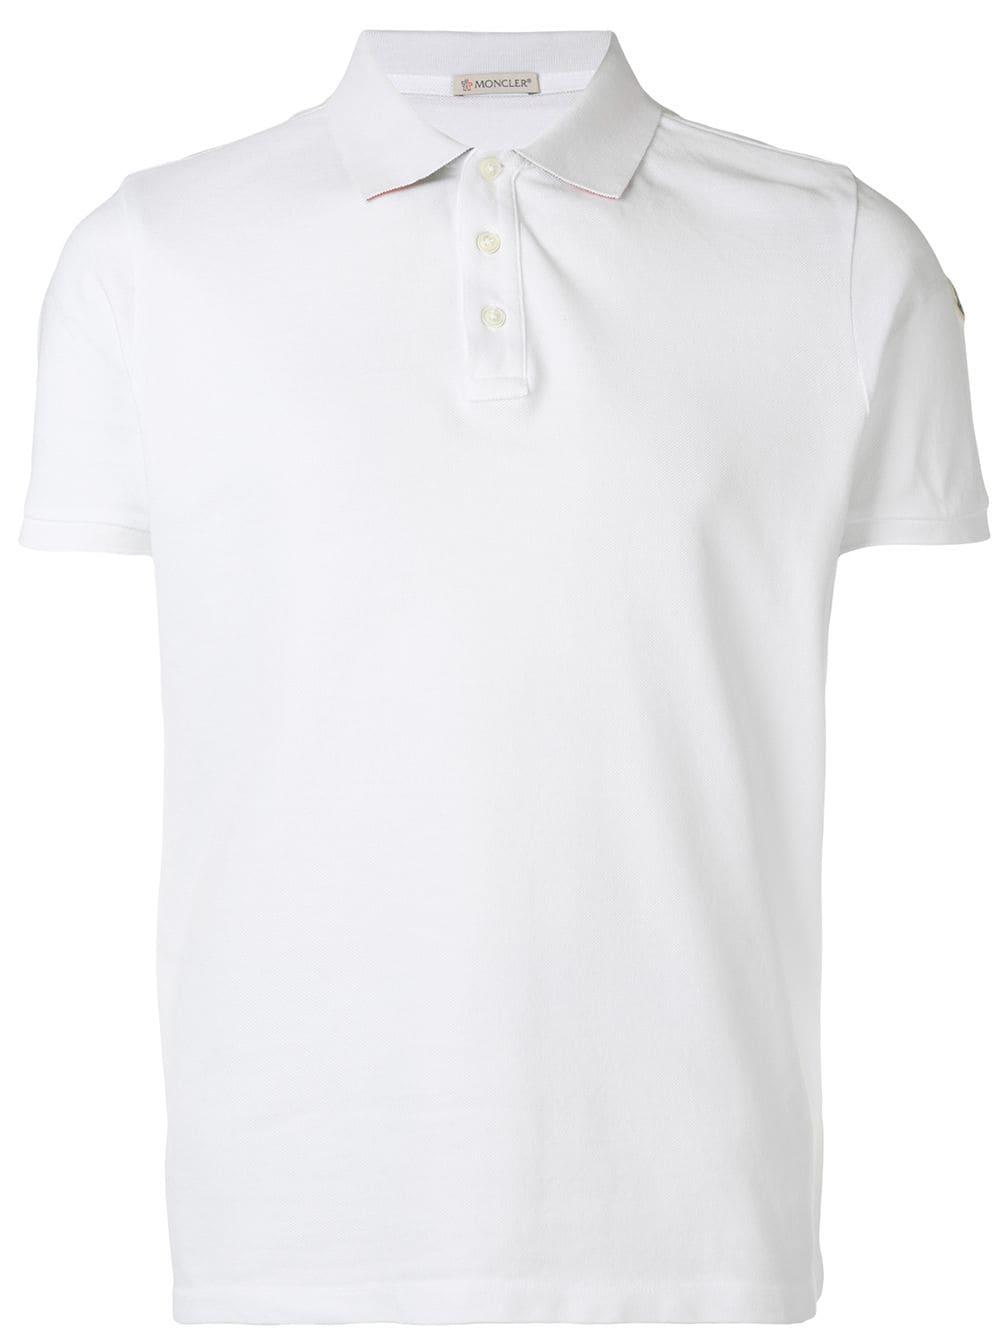 302a9d54a White Classic Polo Shirt - MONCLER - Russocapri